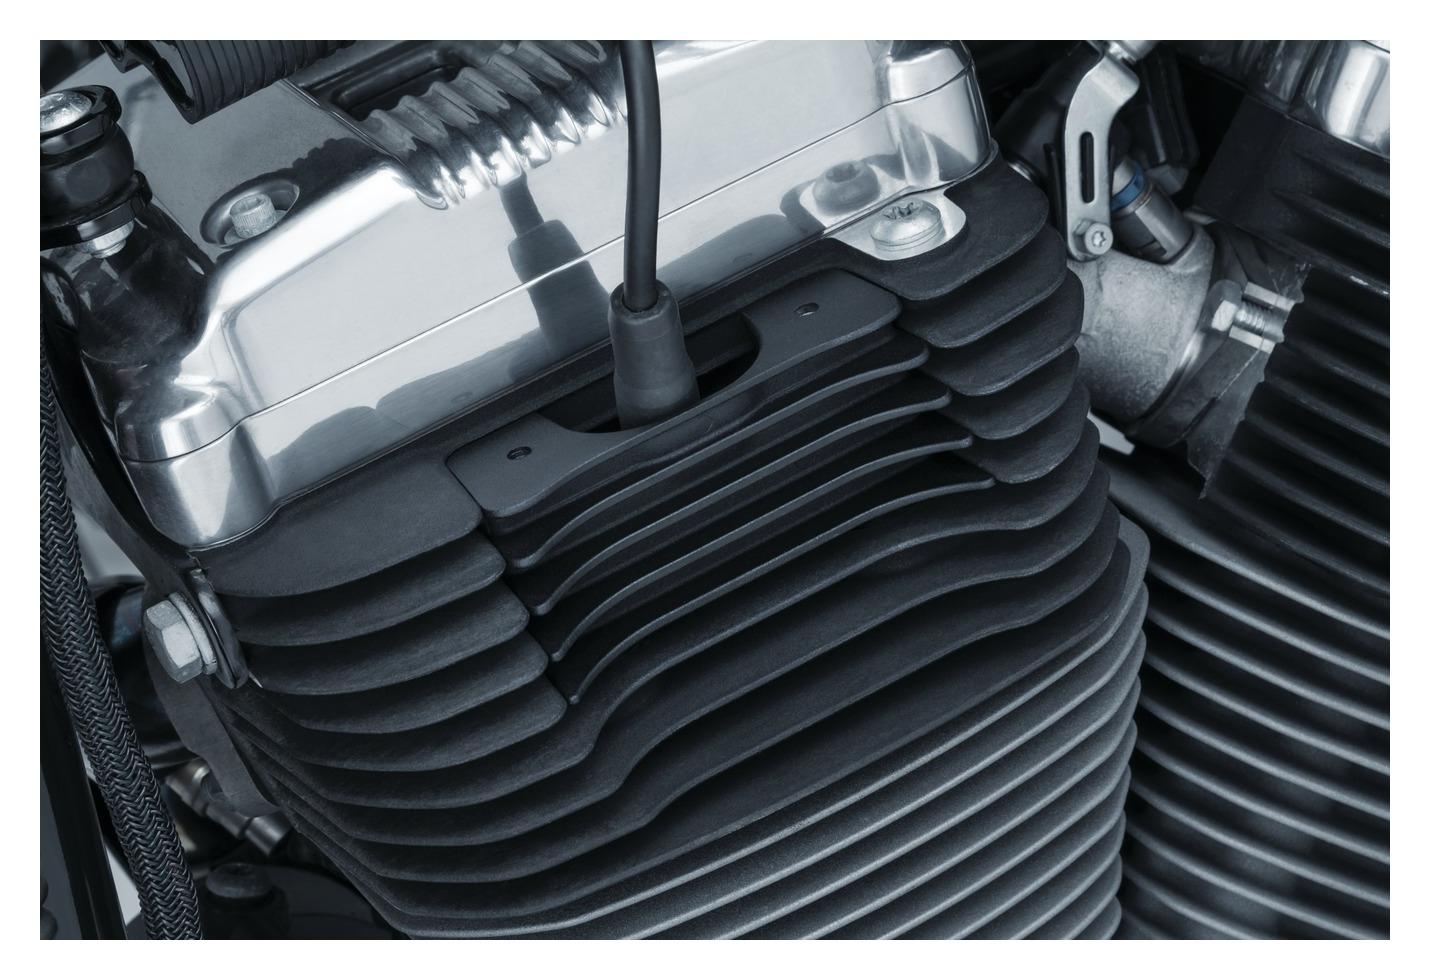 Kuryakyn Finned Spark Plug Covers For Harley Sportster 2004-2020